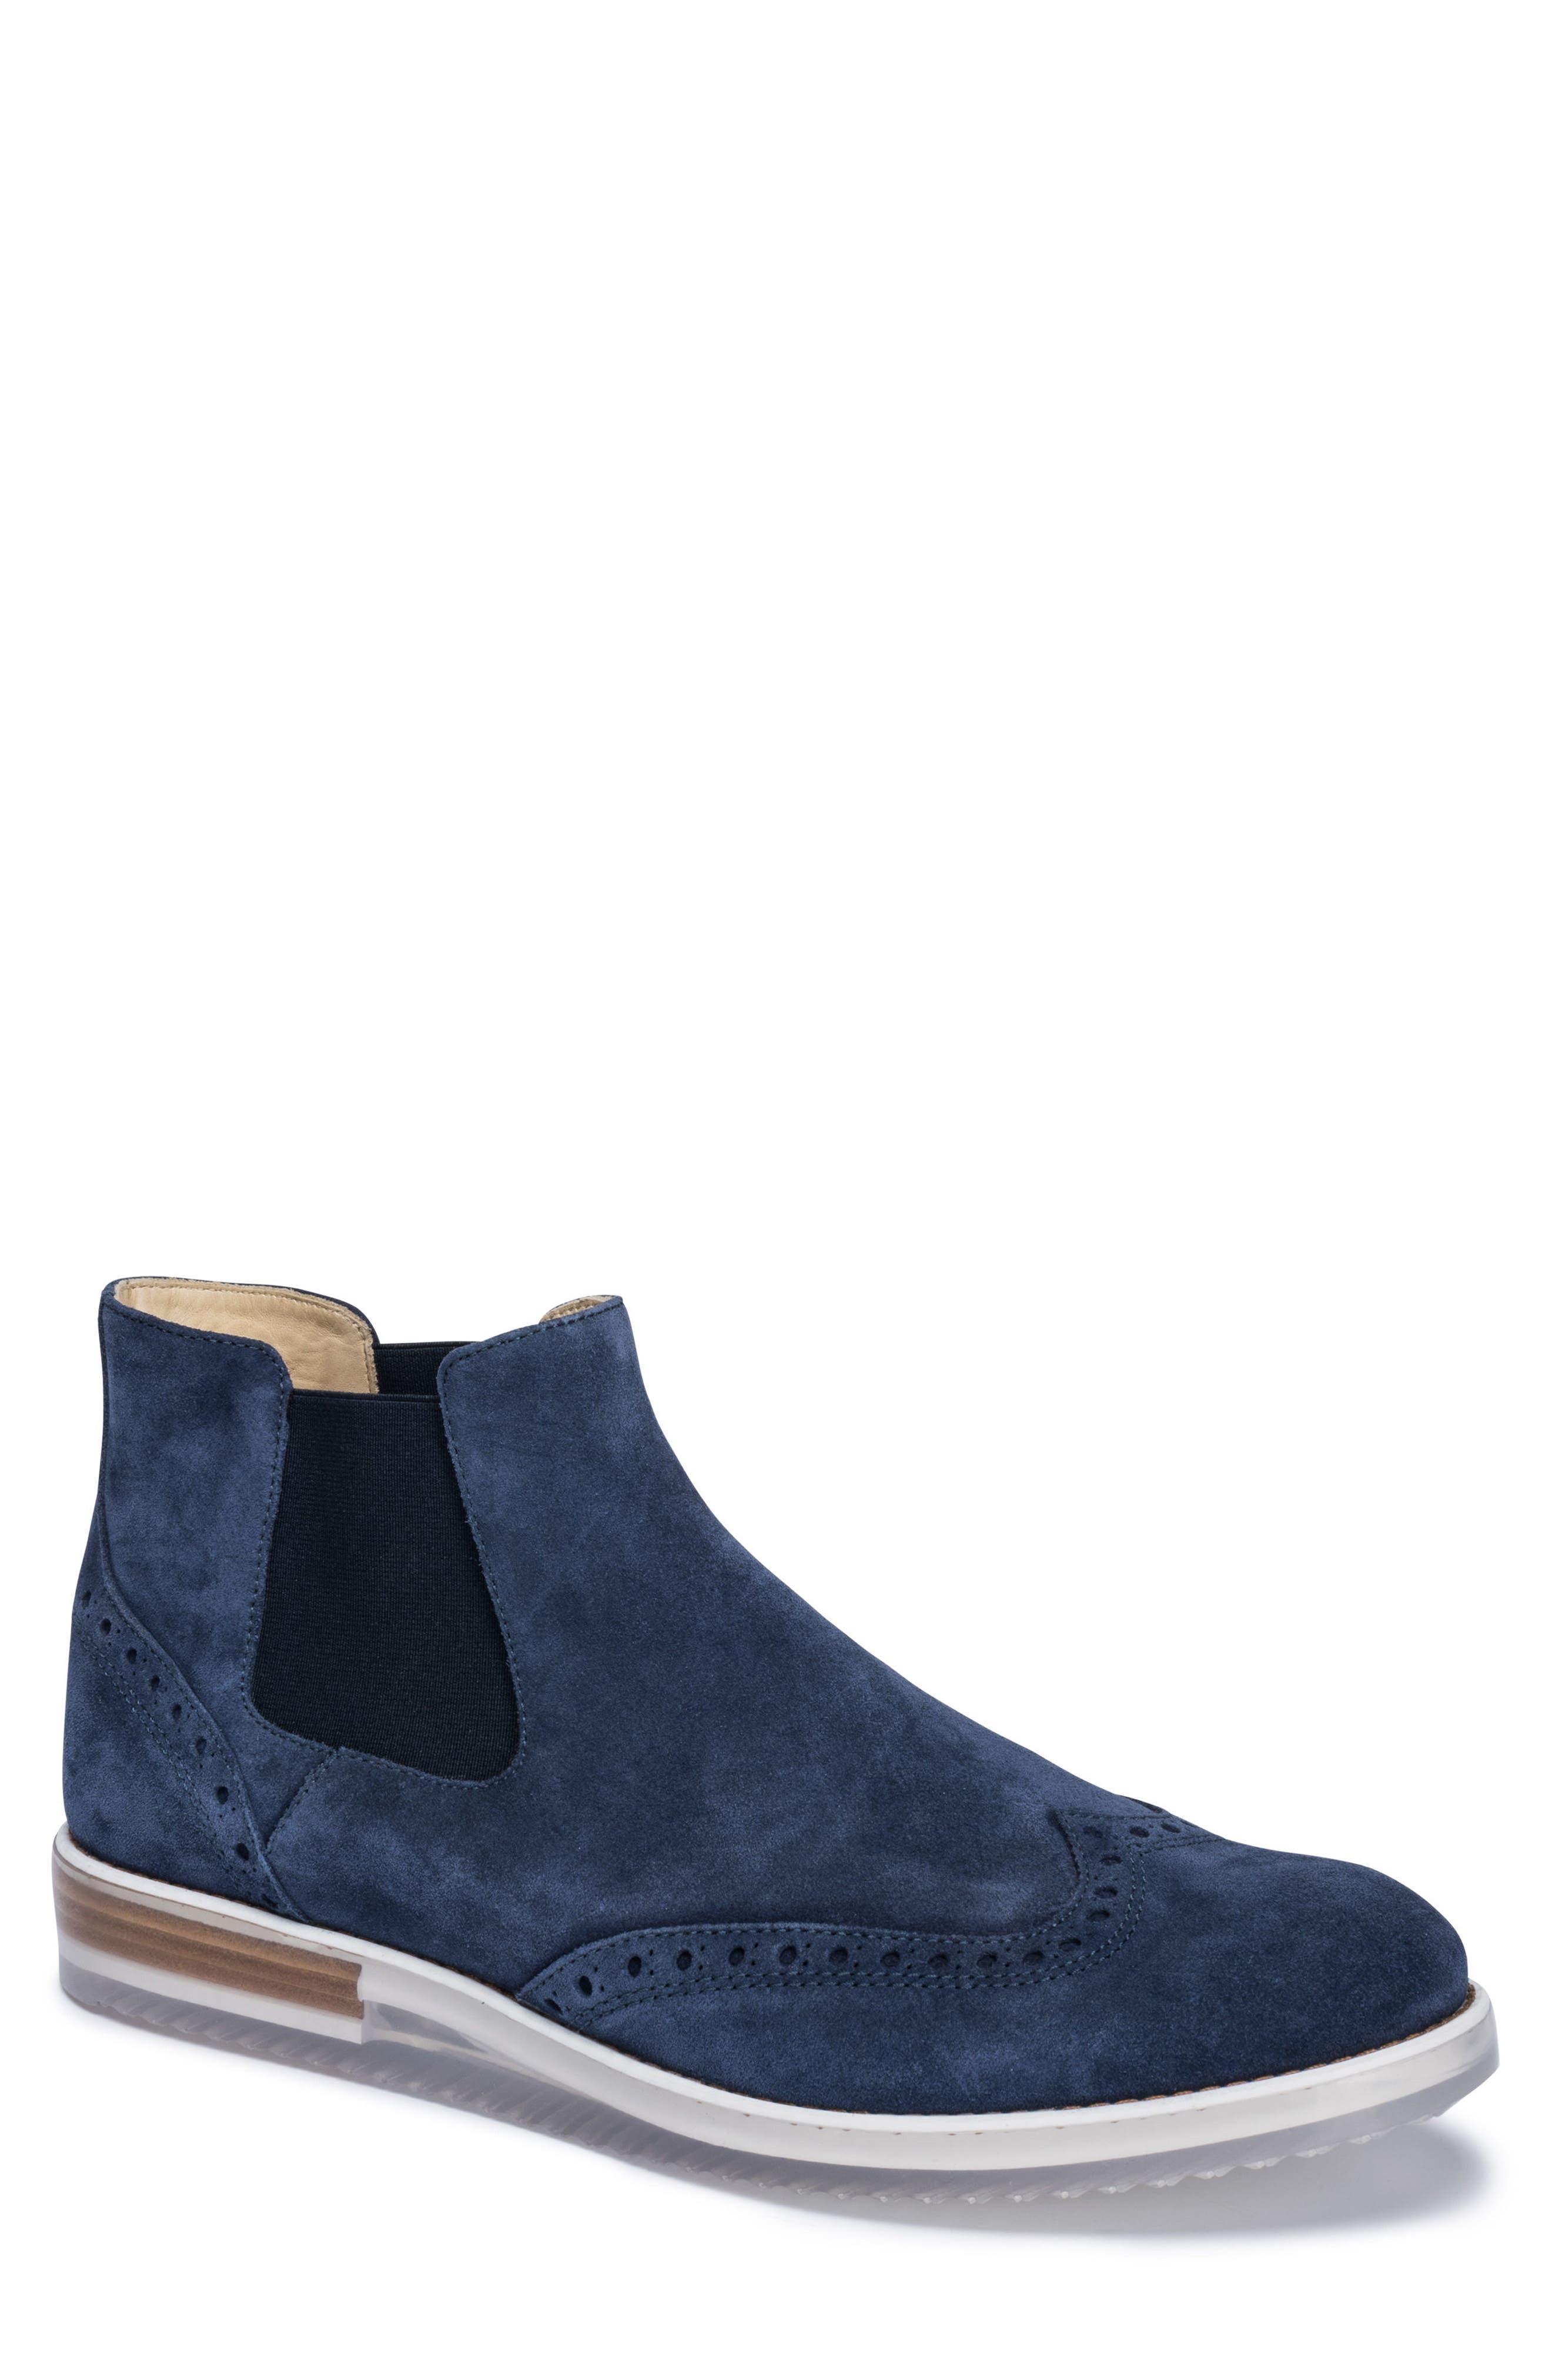 Brescia Mid Chelsea Wingtip Sneaker Boot,                         Main,                         color, 429